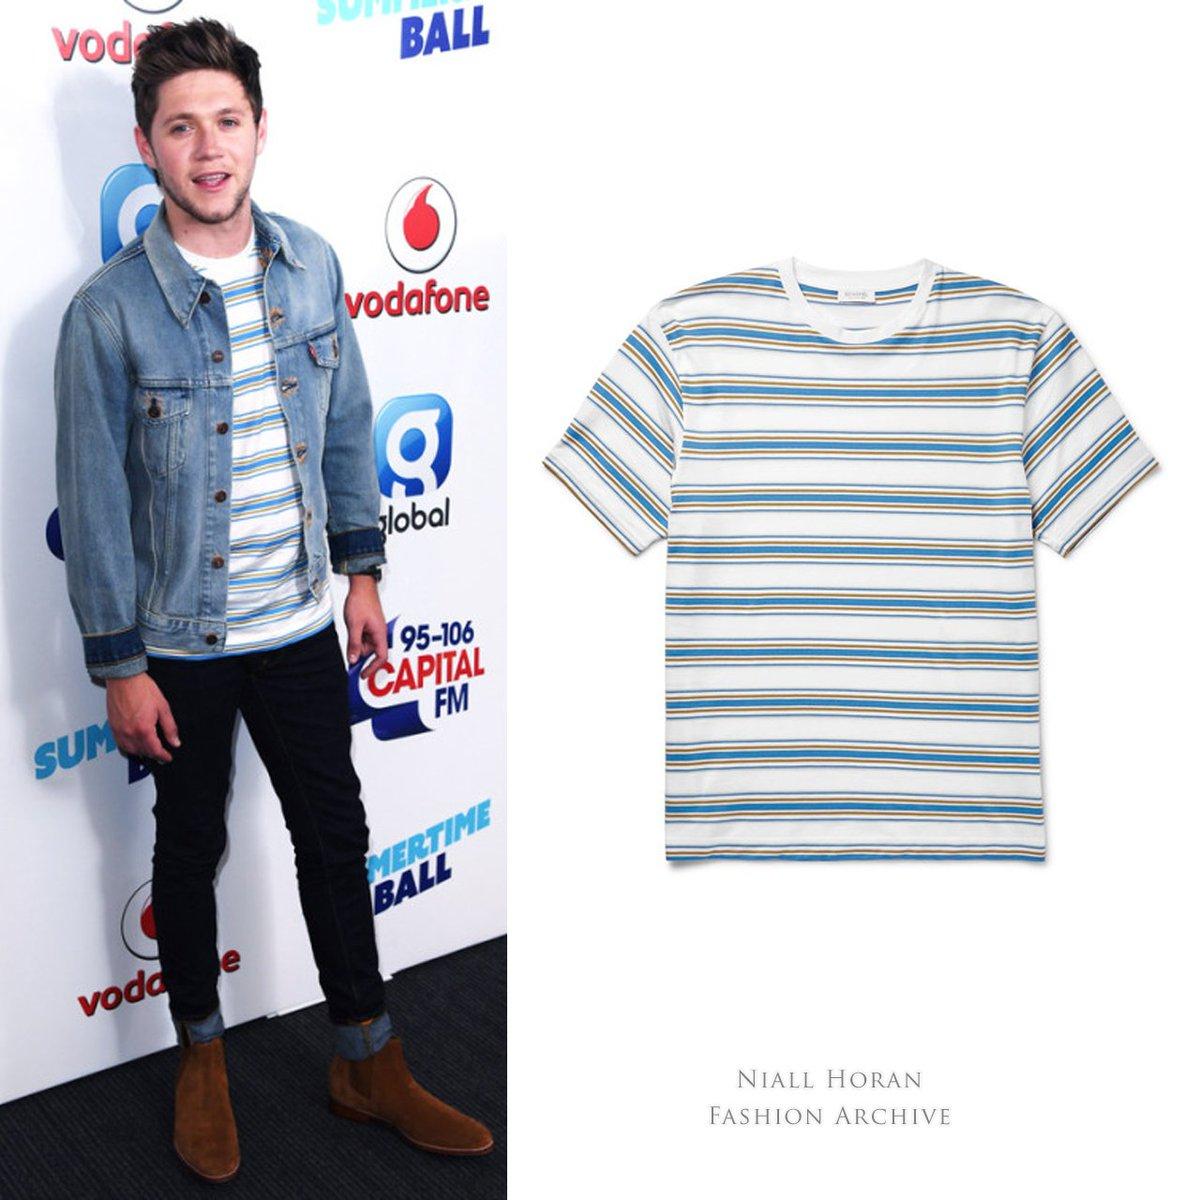 Niall Horan Fashion on Twitter: